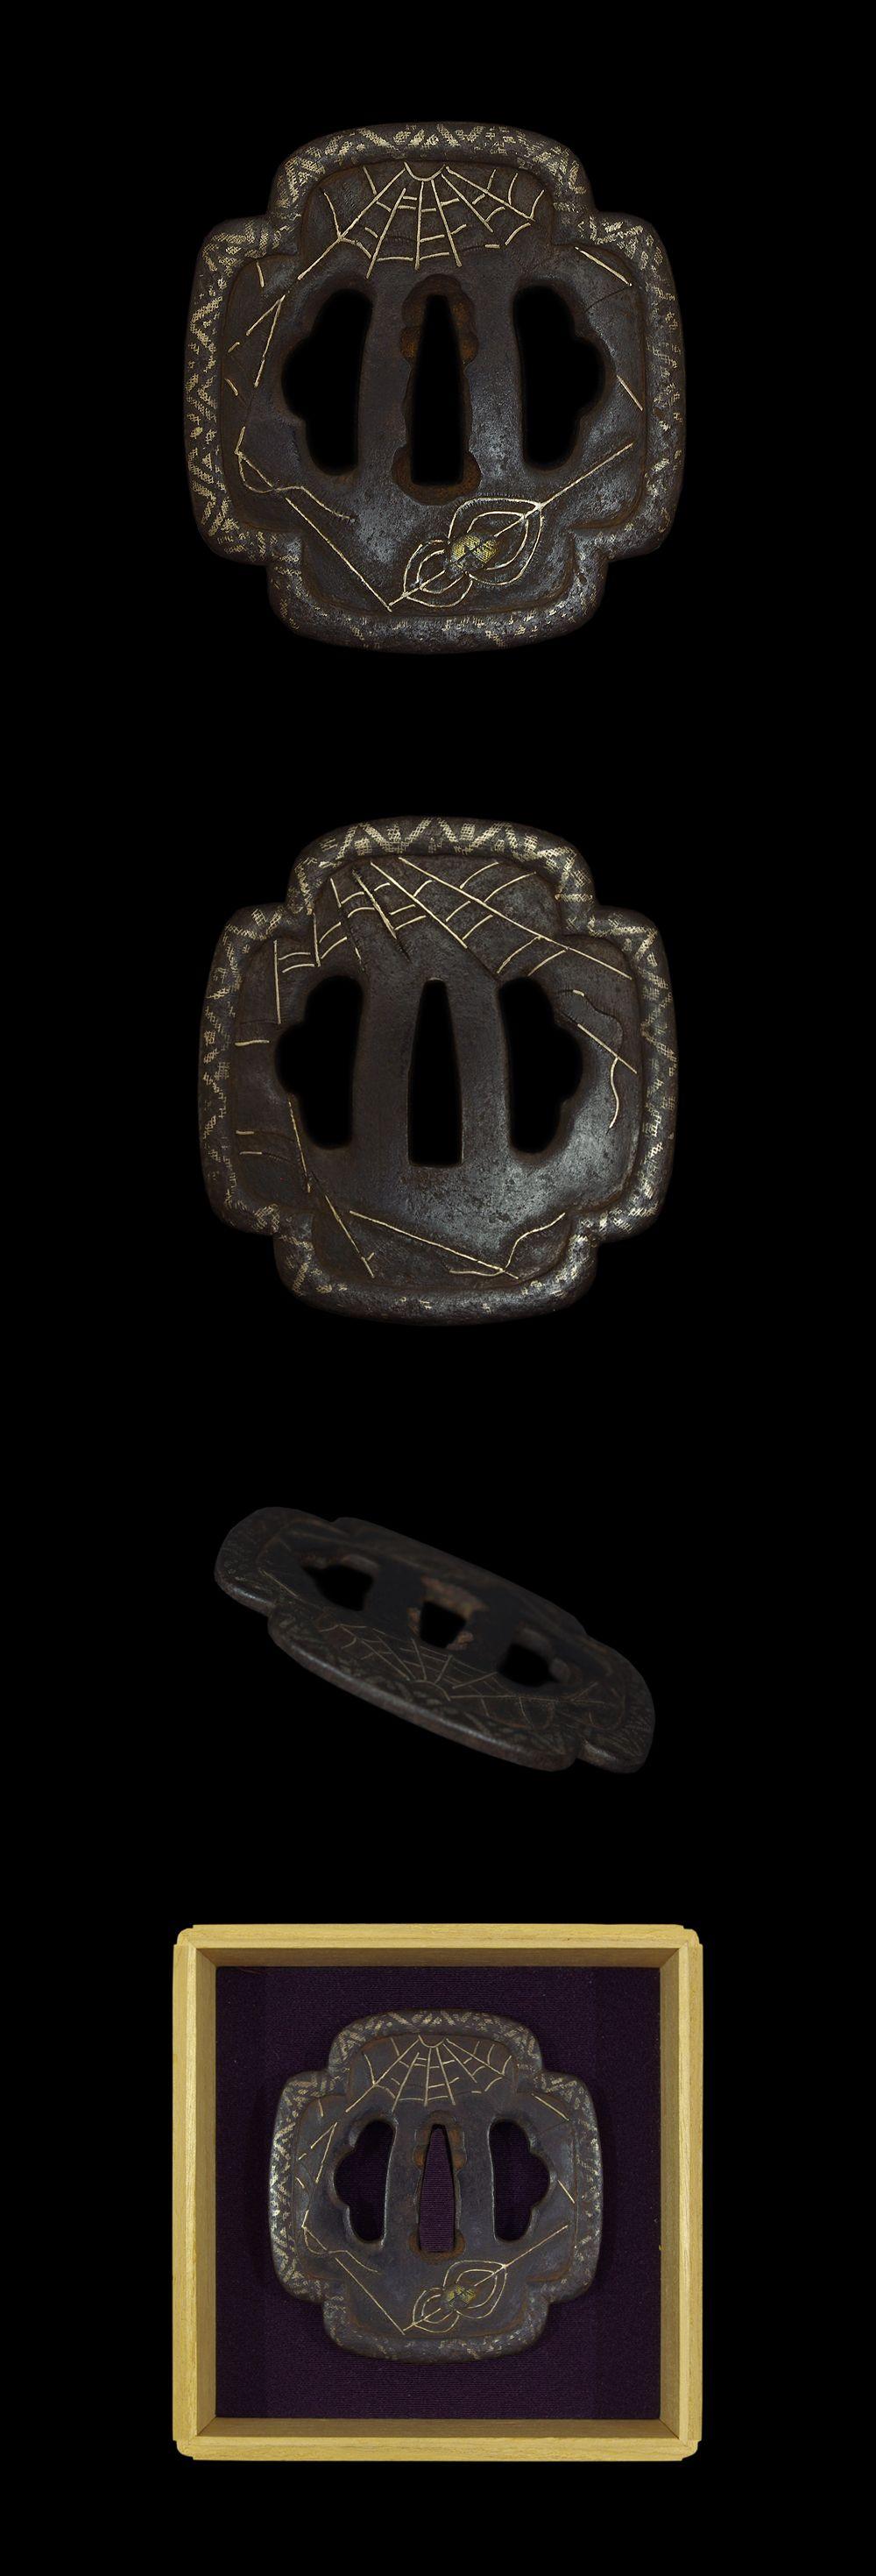 Kumo (spider) zu Tsuba. On the Tatemaru shaped iron Tsuba, Spider and spider web are engraved with gold and silver zougan. The mimi is Sukinokoshi-Dote mimi style with spot nunome zougan